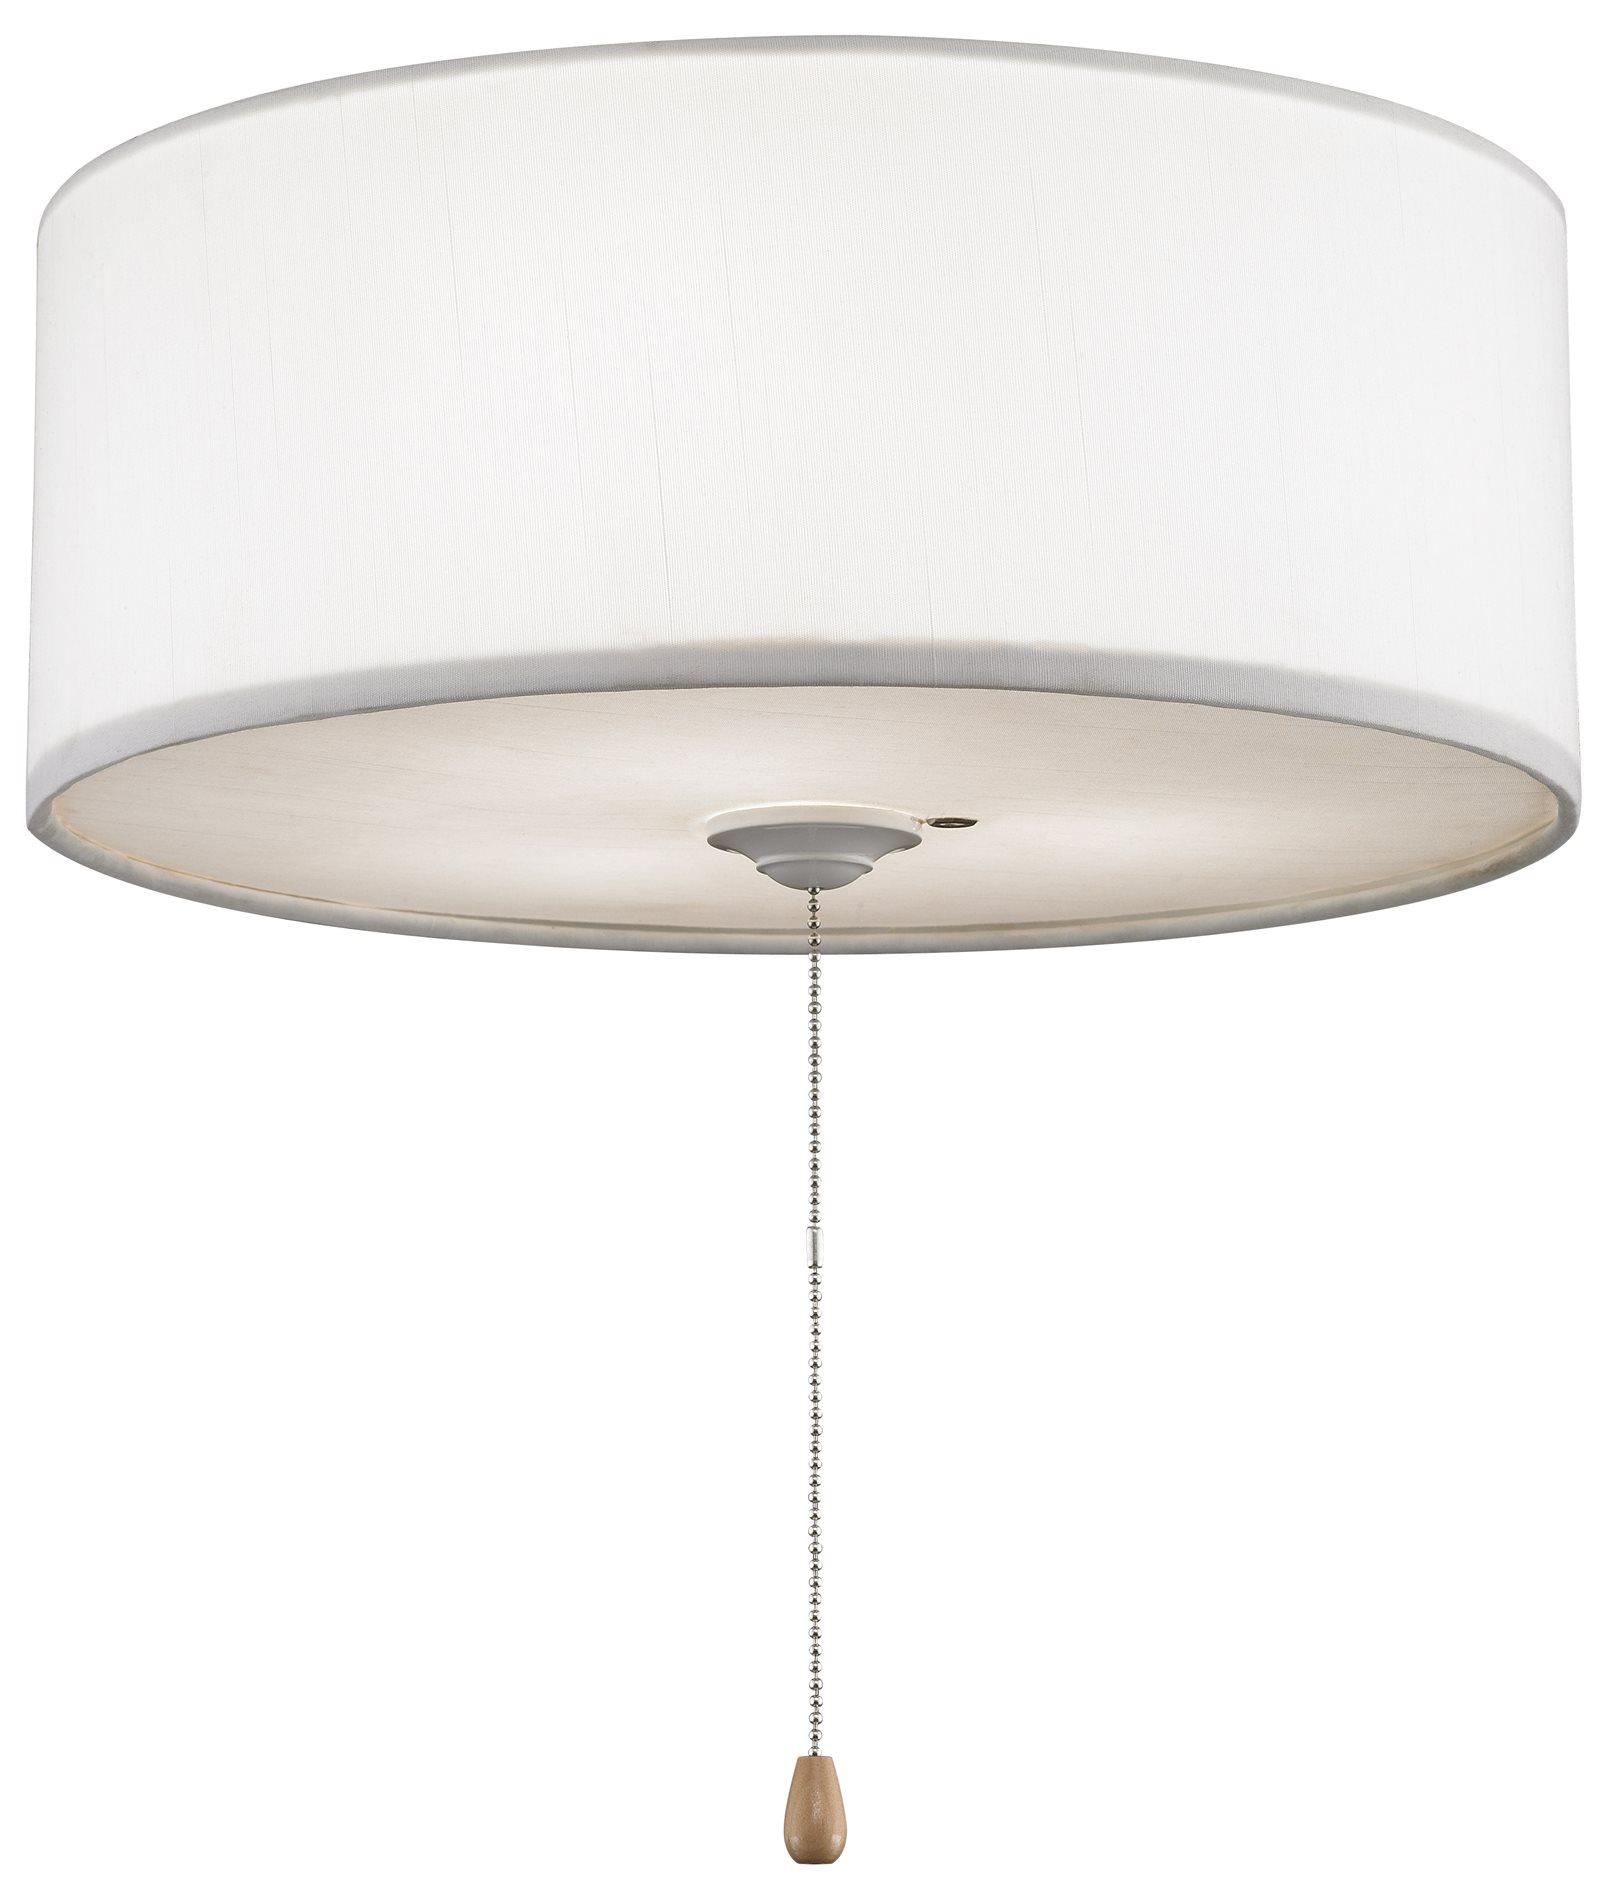 Fanimation Lk113 14 Quot Drum Lamp Shade Ceiling Fan Light Kit